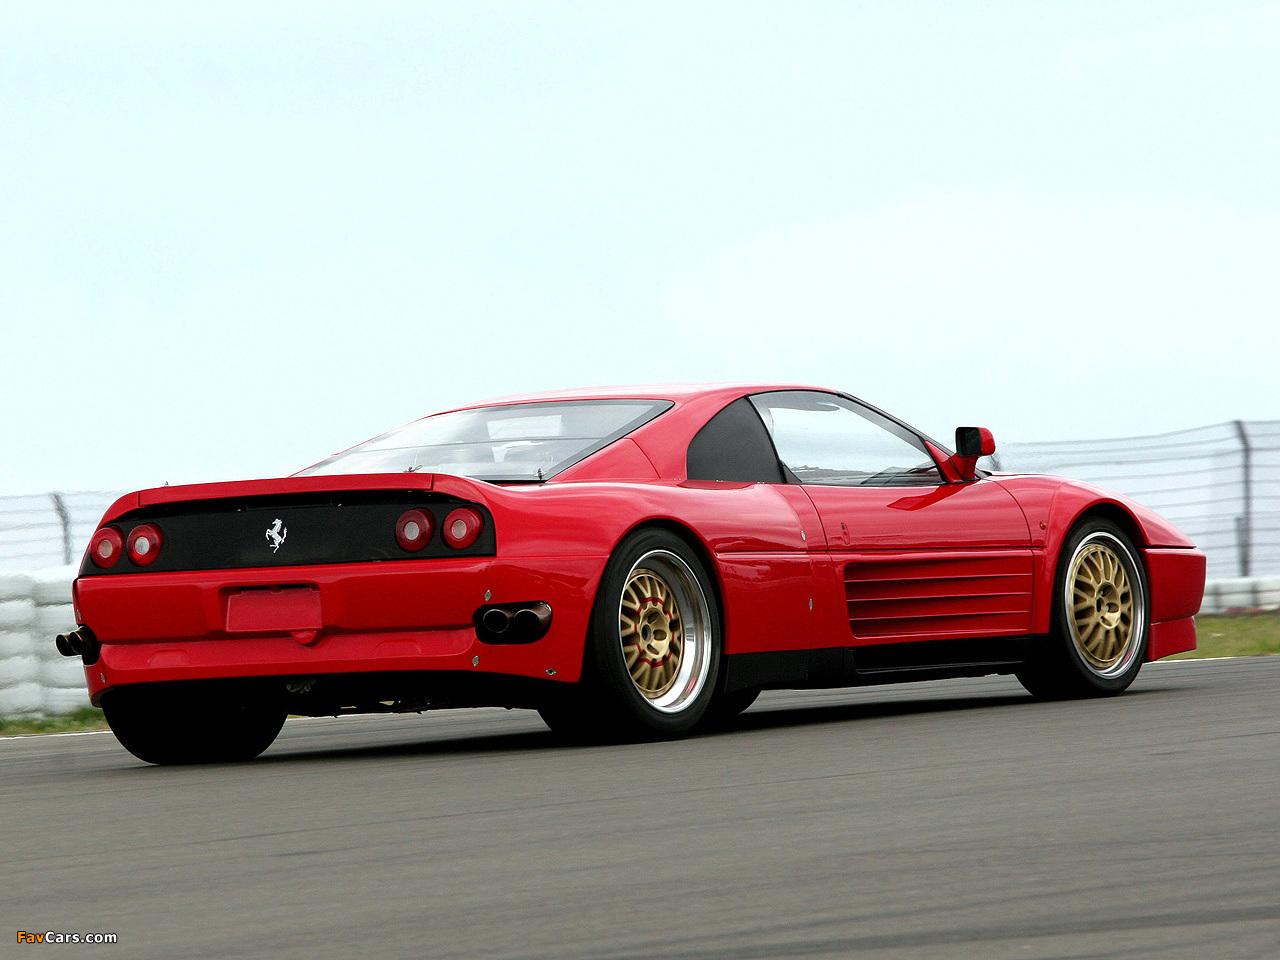 Images Of Ferrari Enzo Prototype M3 2000 1280x960